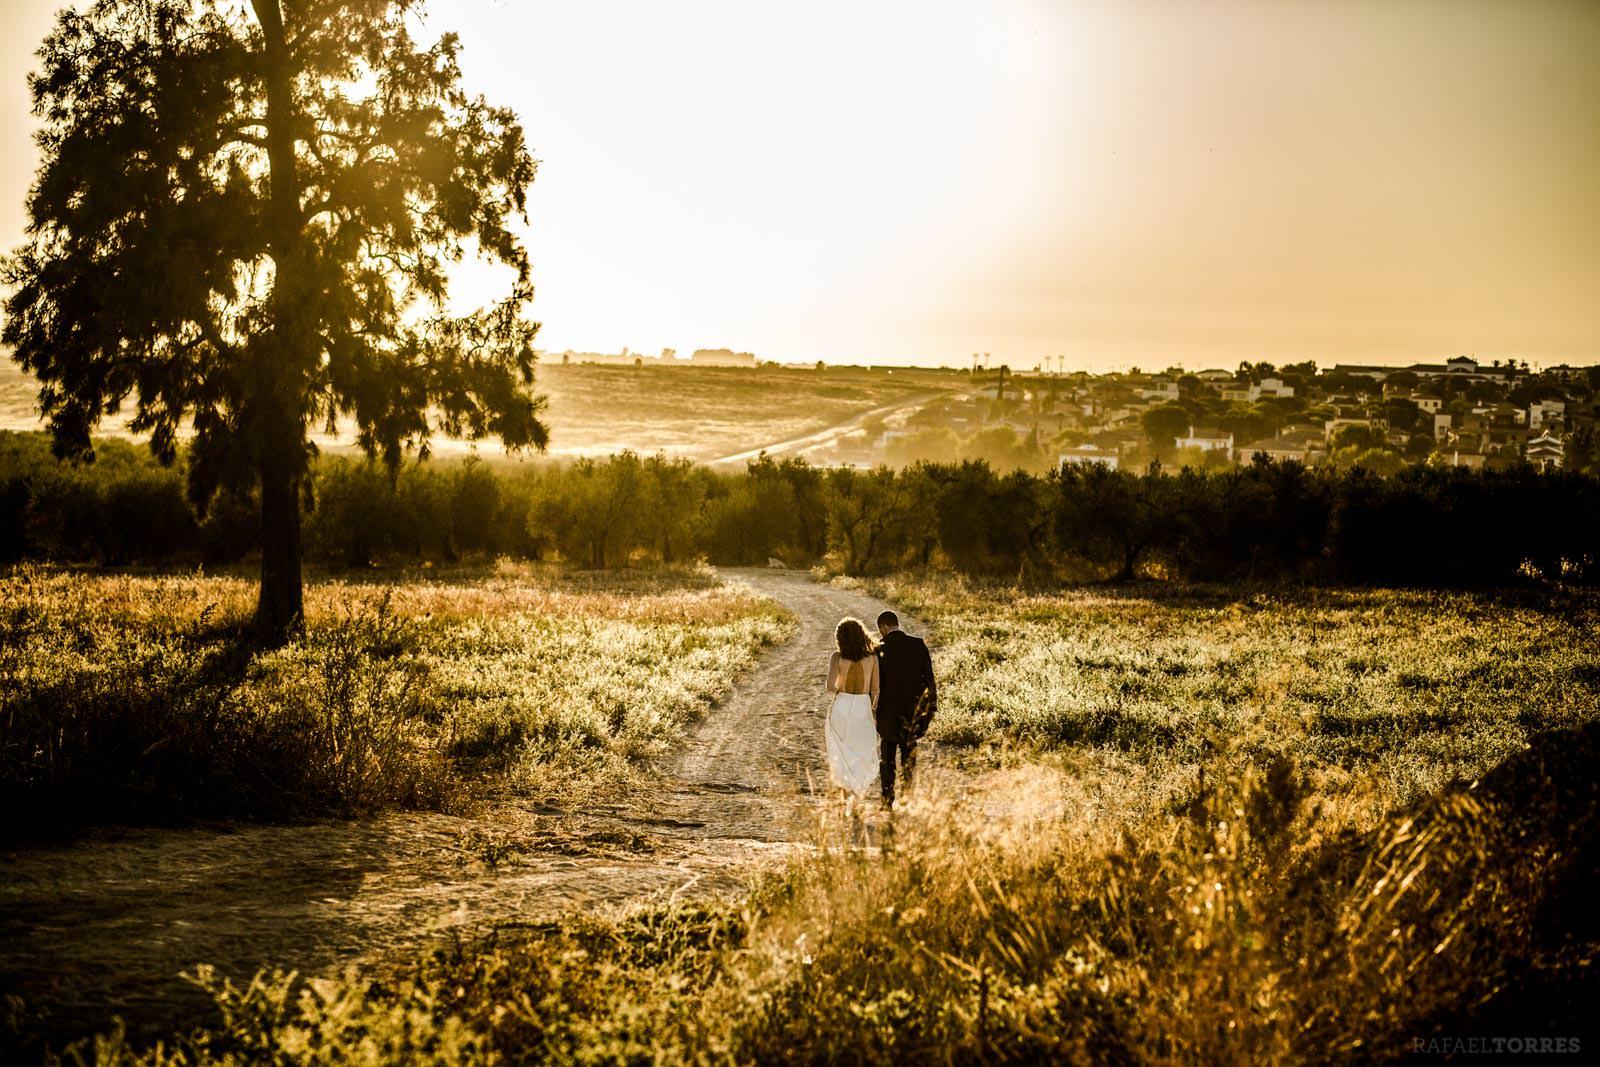 Rafael+Torres+fotografo+bodas+sevilla+madrid+barcelona+wedding+photographer+bodas+diferentes+bodaensevilla+molinillos+fotografo+hacienda+oran+alfonso+wedding+photographer-45.jpg